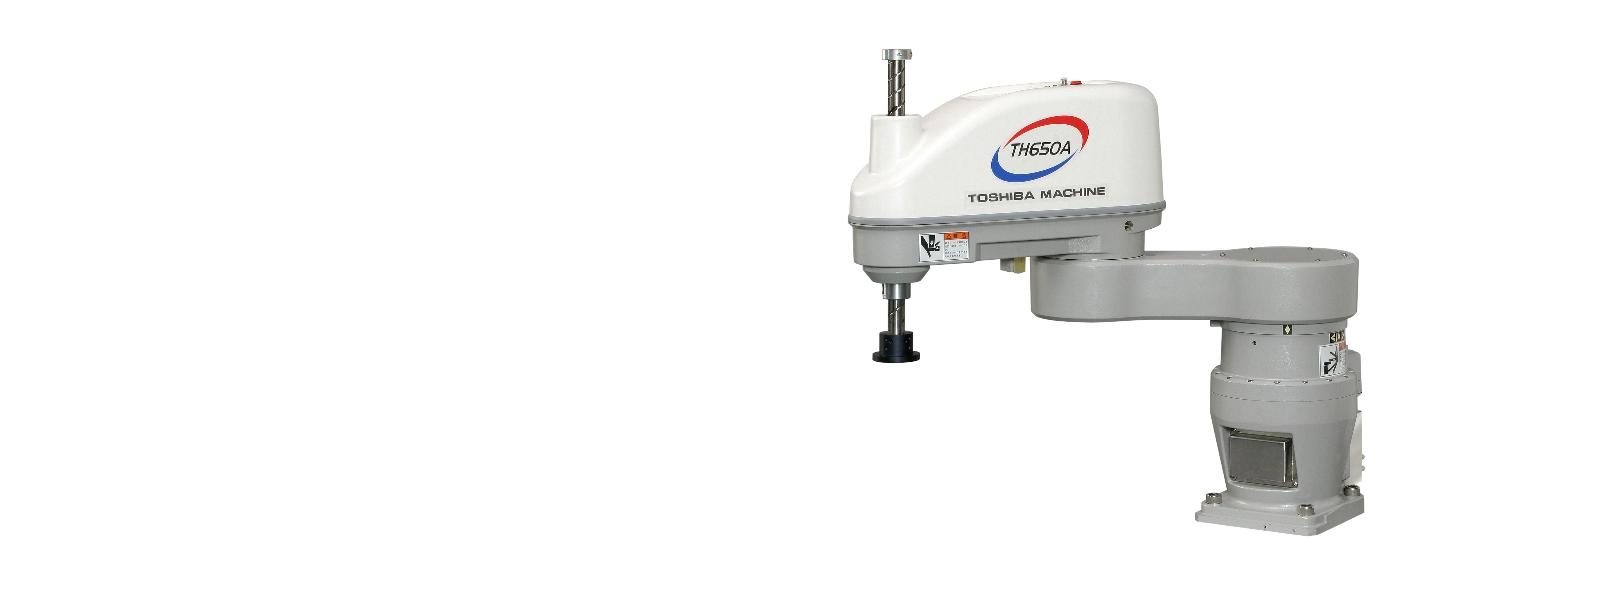 SCARA industrial robot caionix toshiba machine egypt